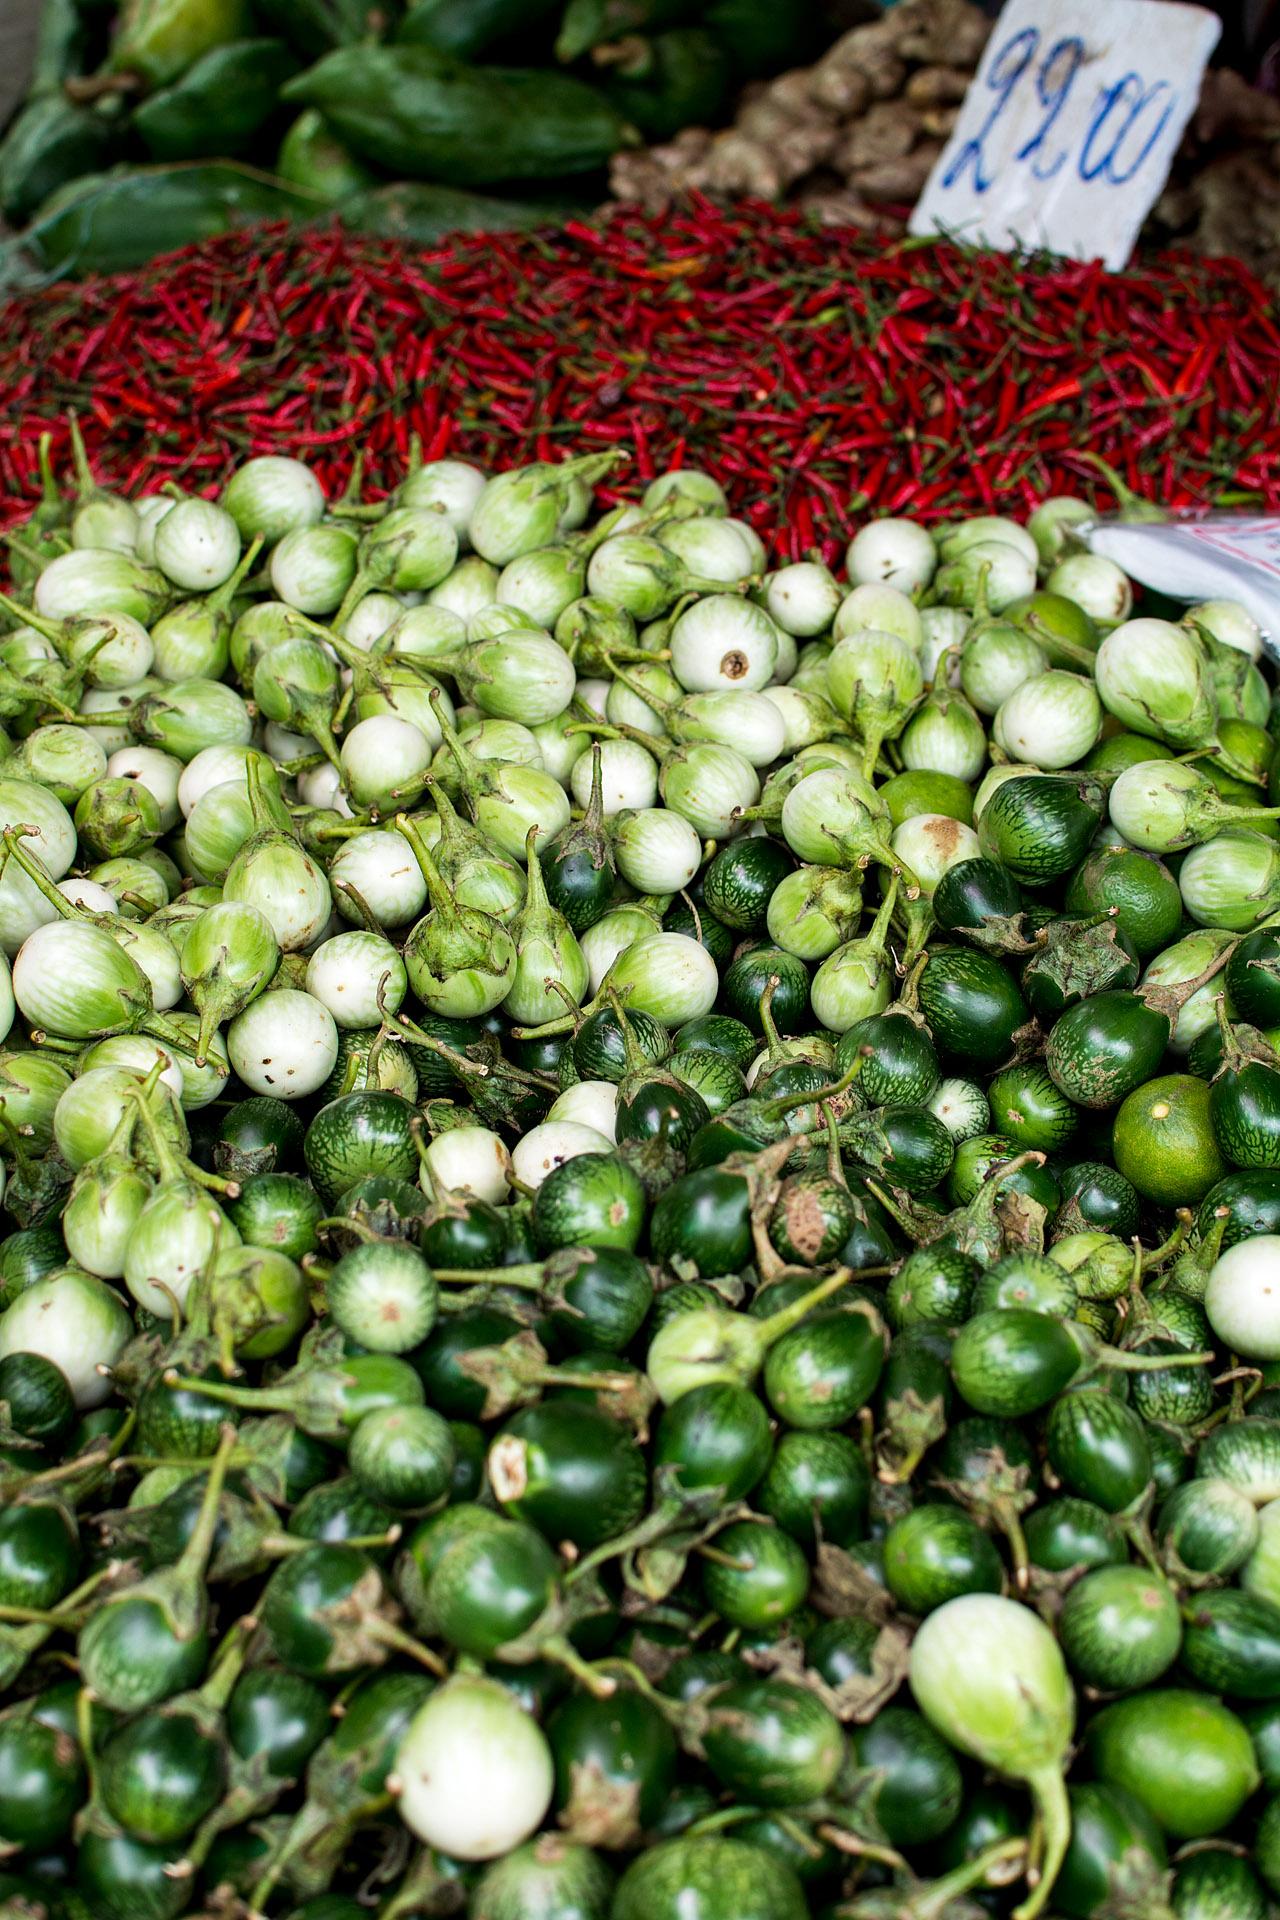 Thai eggplant & chilies